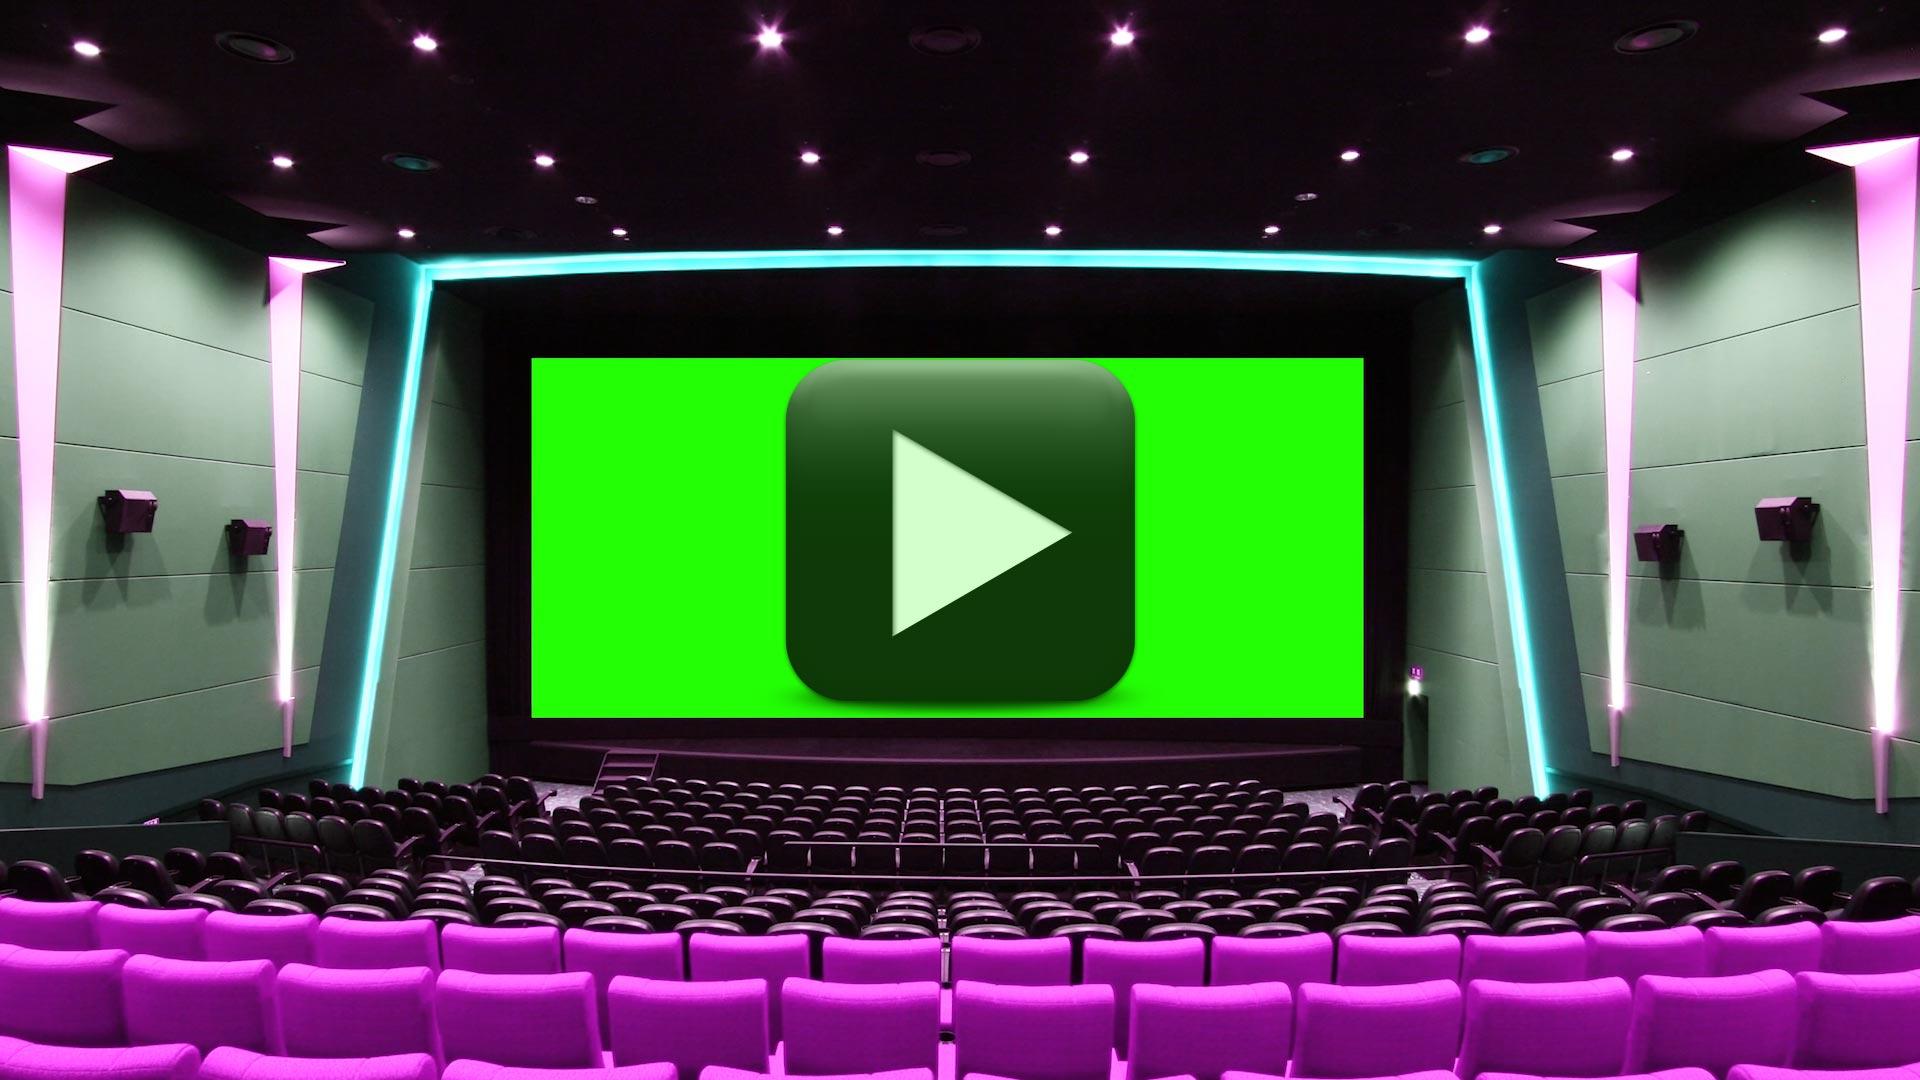 Cinema Hall Green Screen-Wedding Video Background